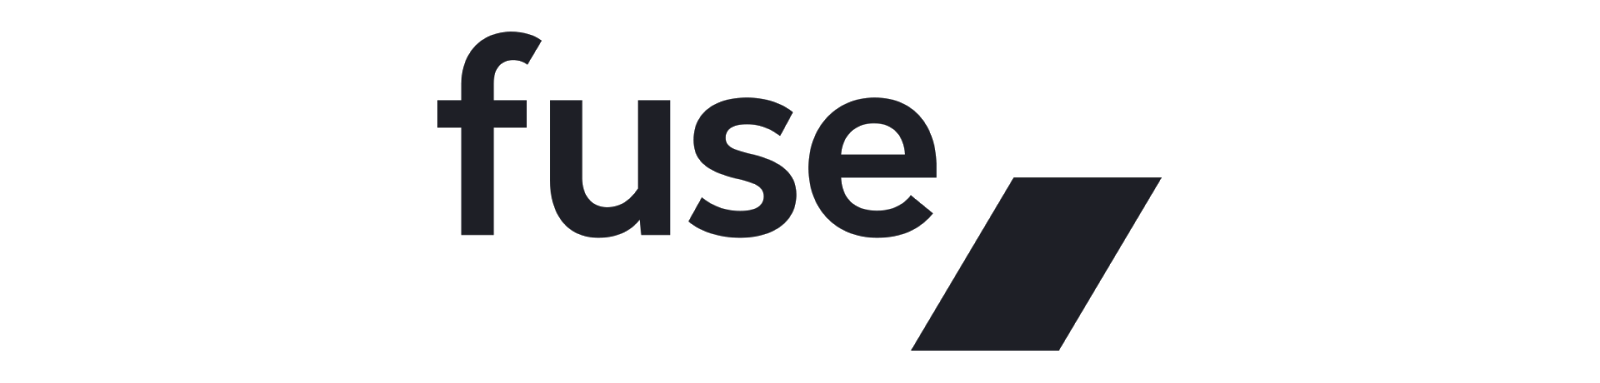 Fuse Tools